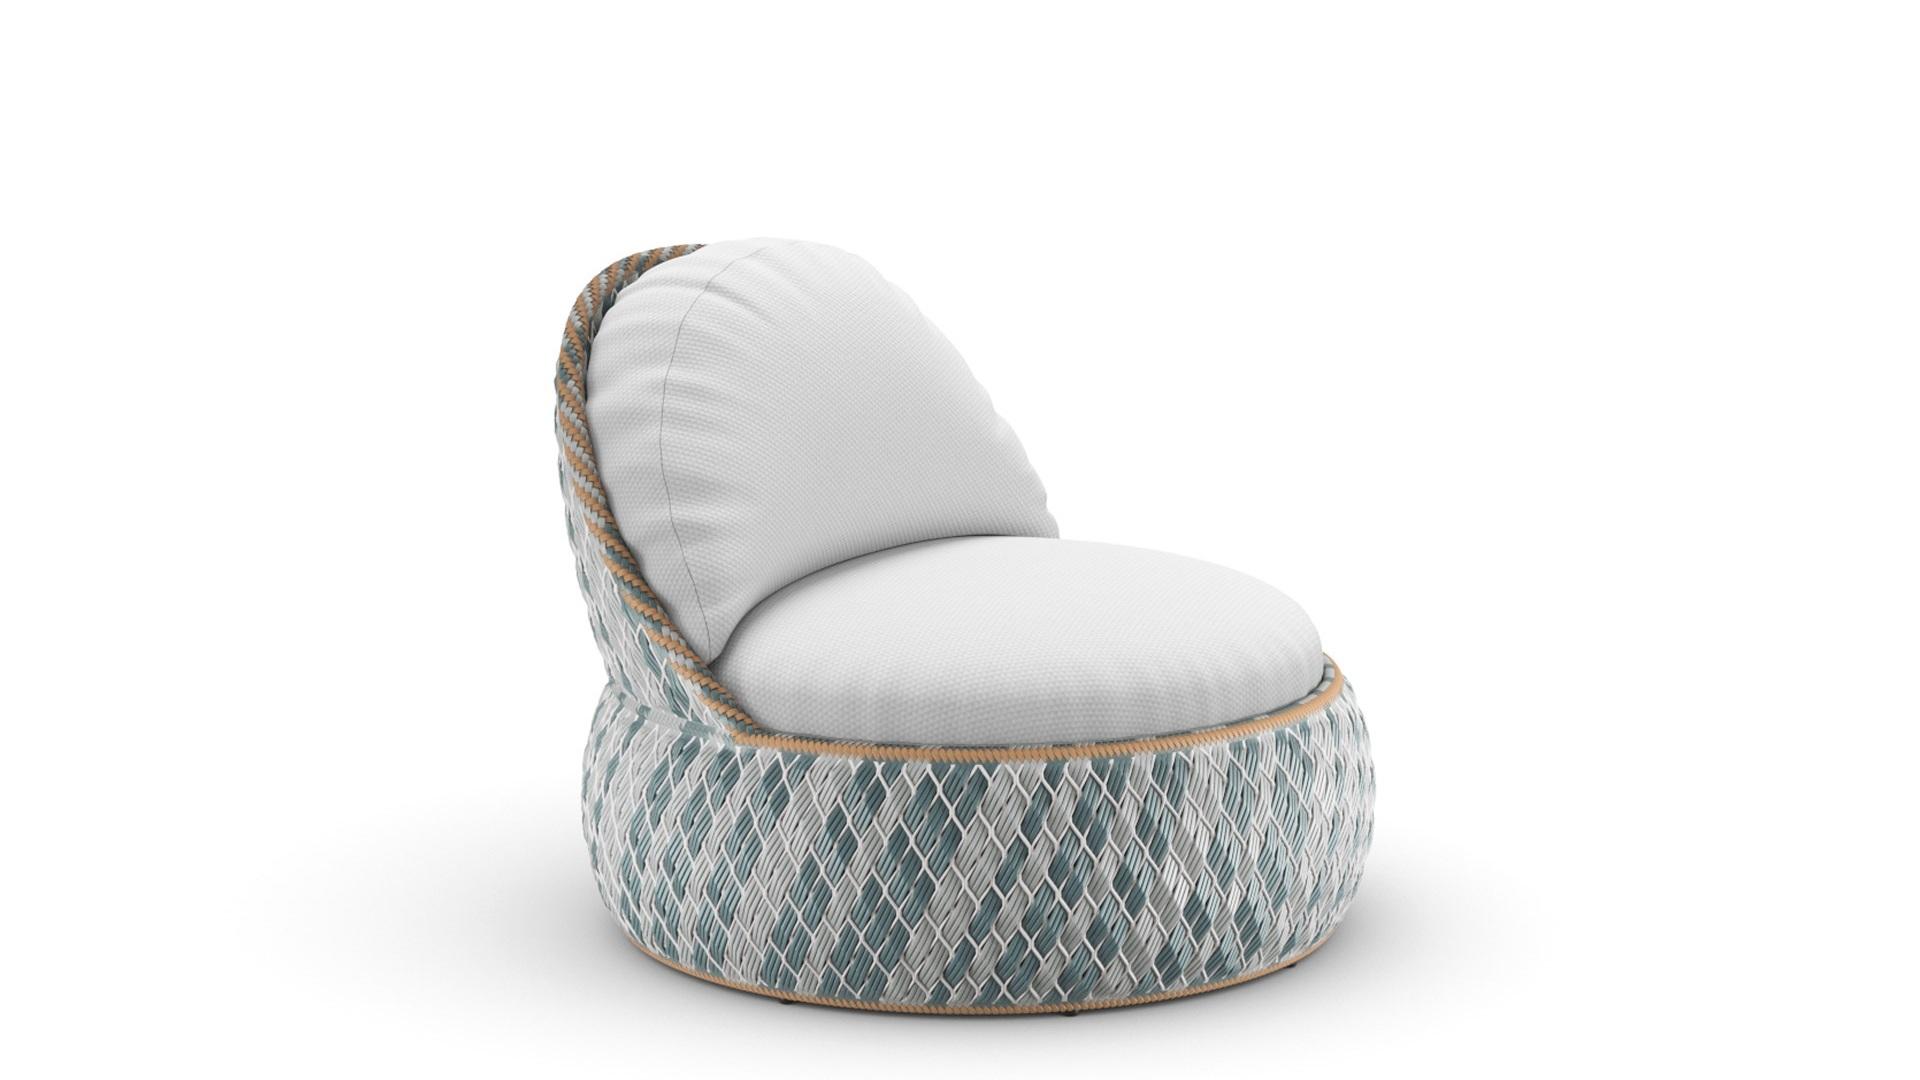 DEDON-DALA-Lounge-chair-bahamas-cool-white.jpg